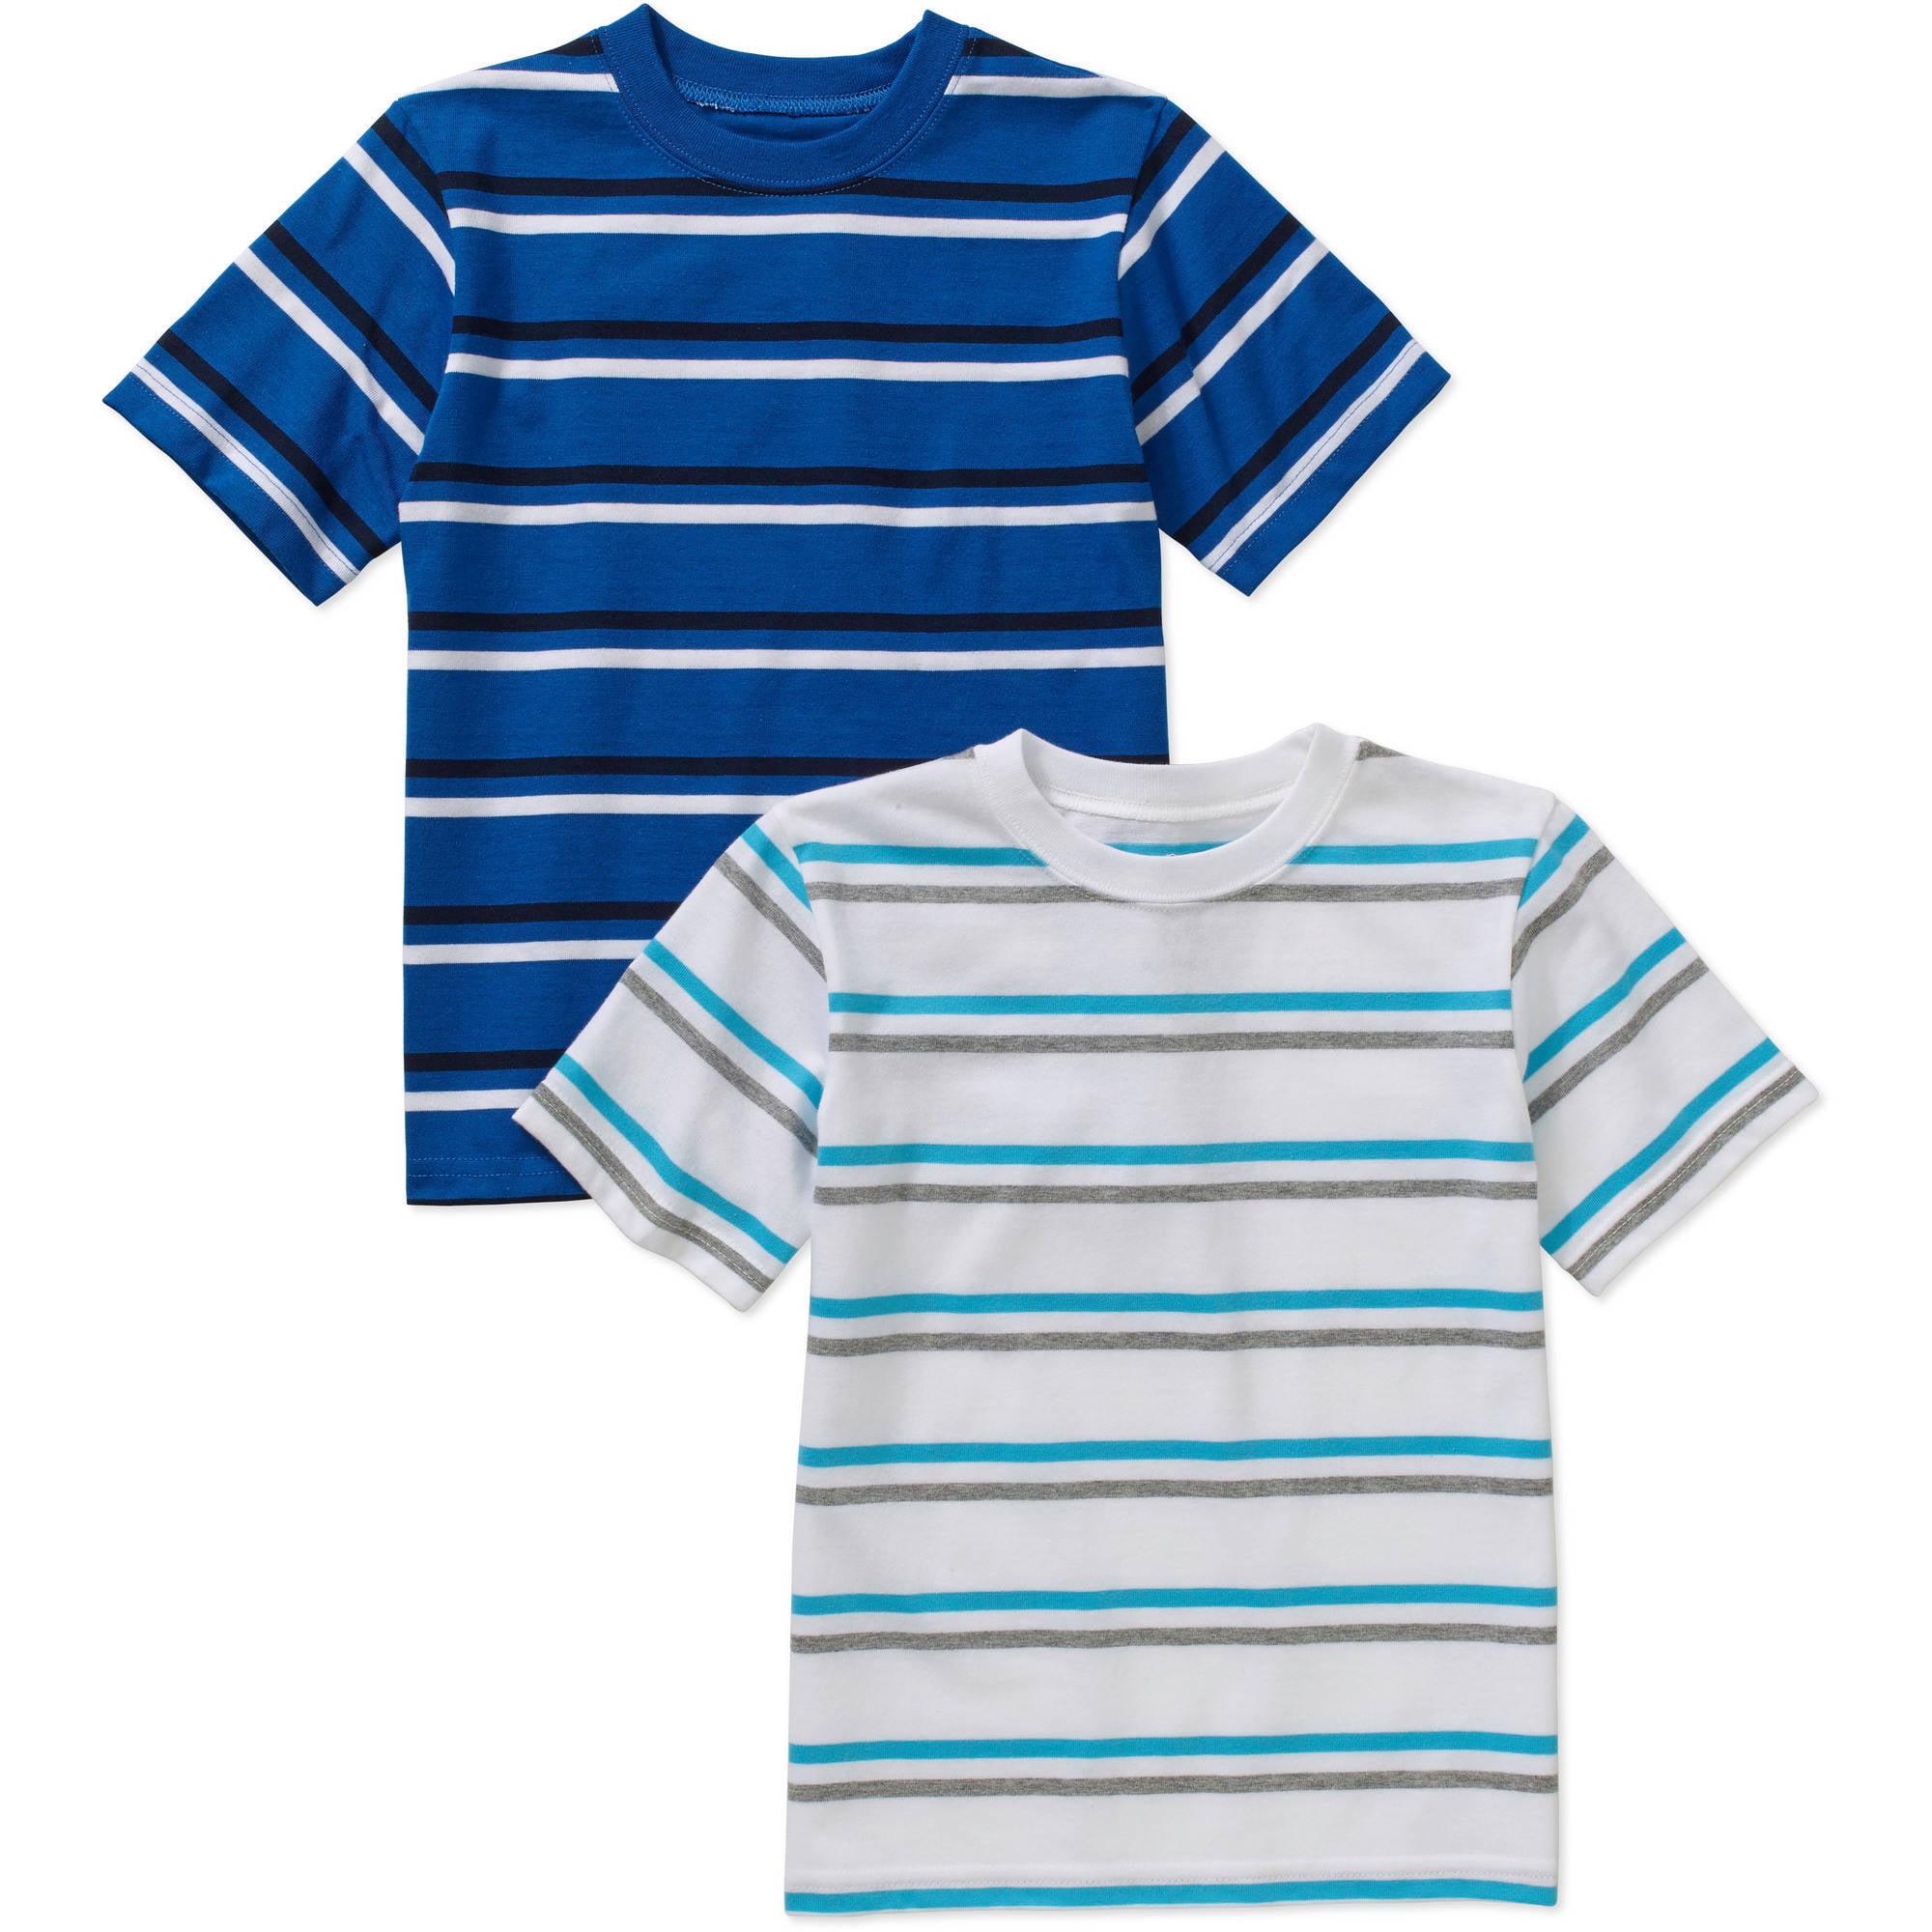 365 Kids From Garanimals Boys' 2 Piece Short Sleeve Stripe Tee Set